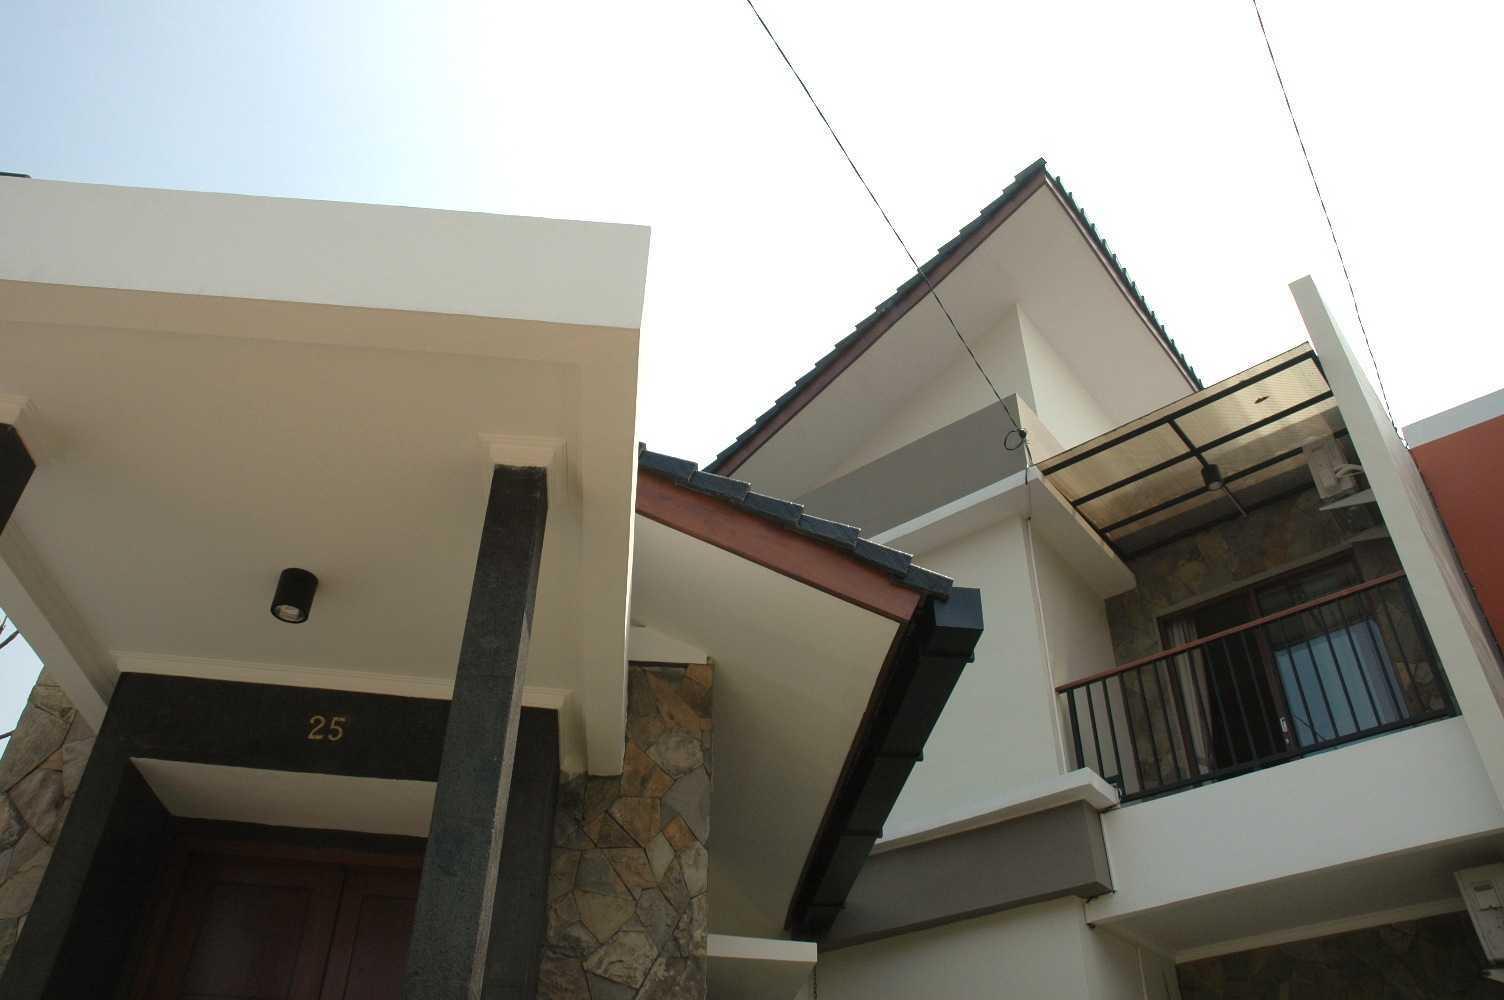 Triplus Homes Es House Rempoa, Ciputat Tim., Kota Tangerang Selatan, Banten, Indonesia Rempoa, Ciputat Tim., Kota Tangerang Selatan, Banten, Indonesia Triplus-Homes-Es-House  56612